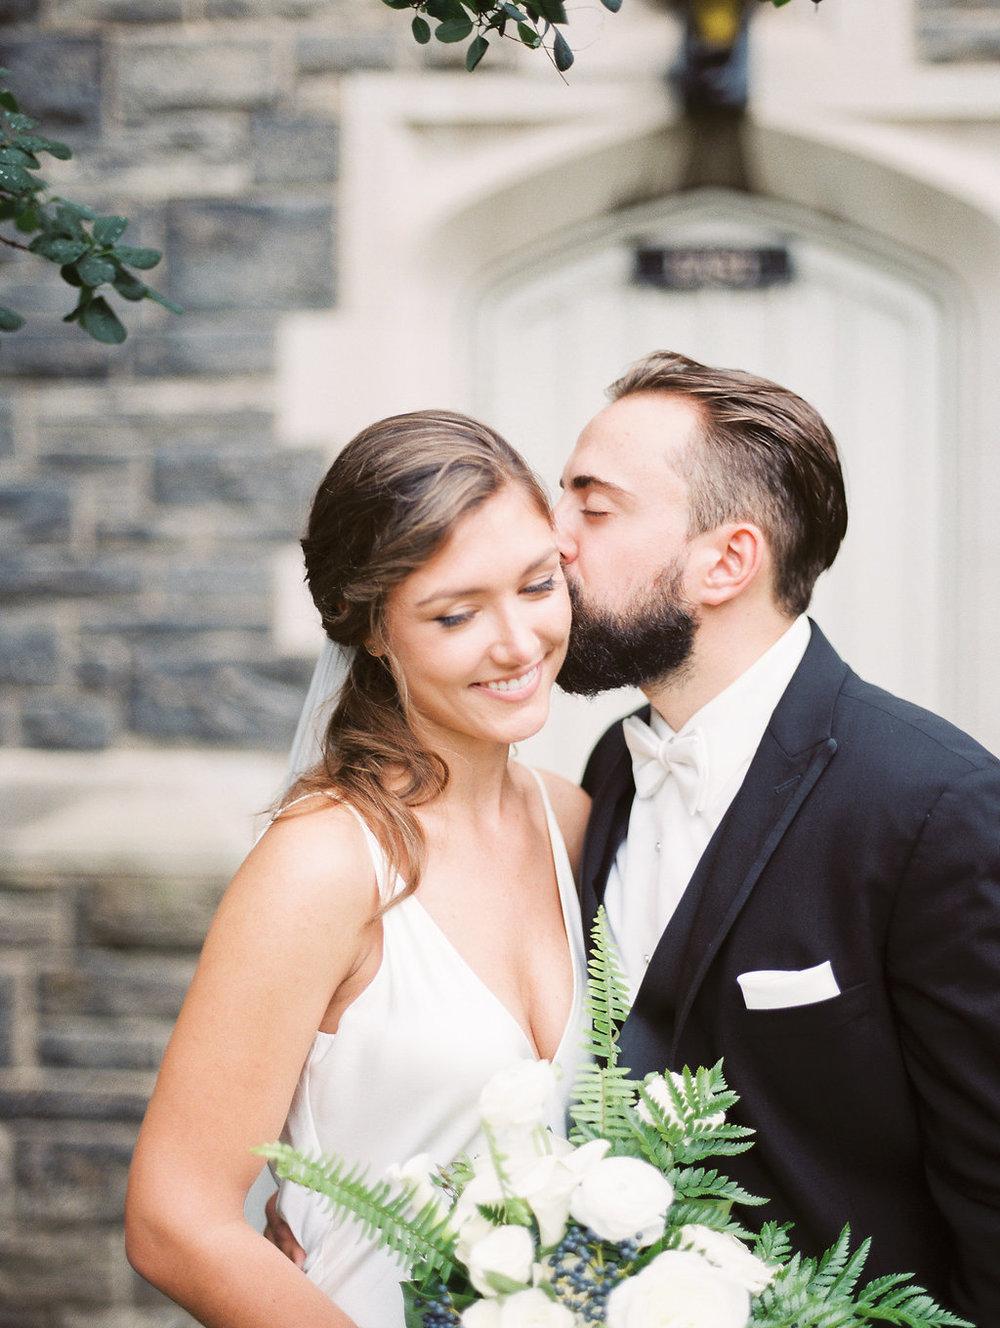 Romantic white and green bridal bouquet| Quill+Oak Floral Design Toronto, Hamilton, Niagara